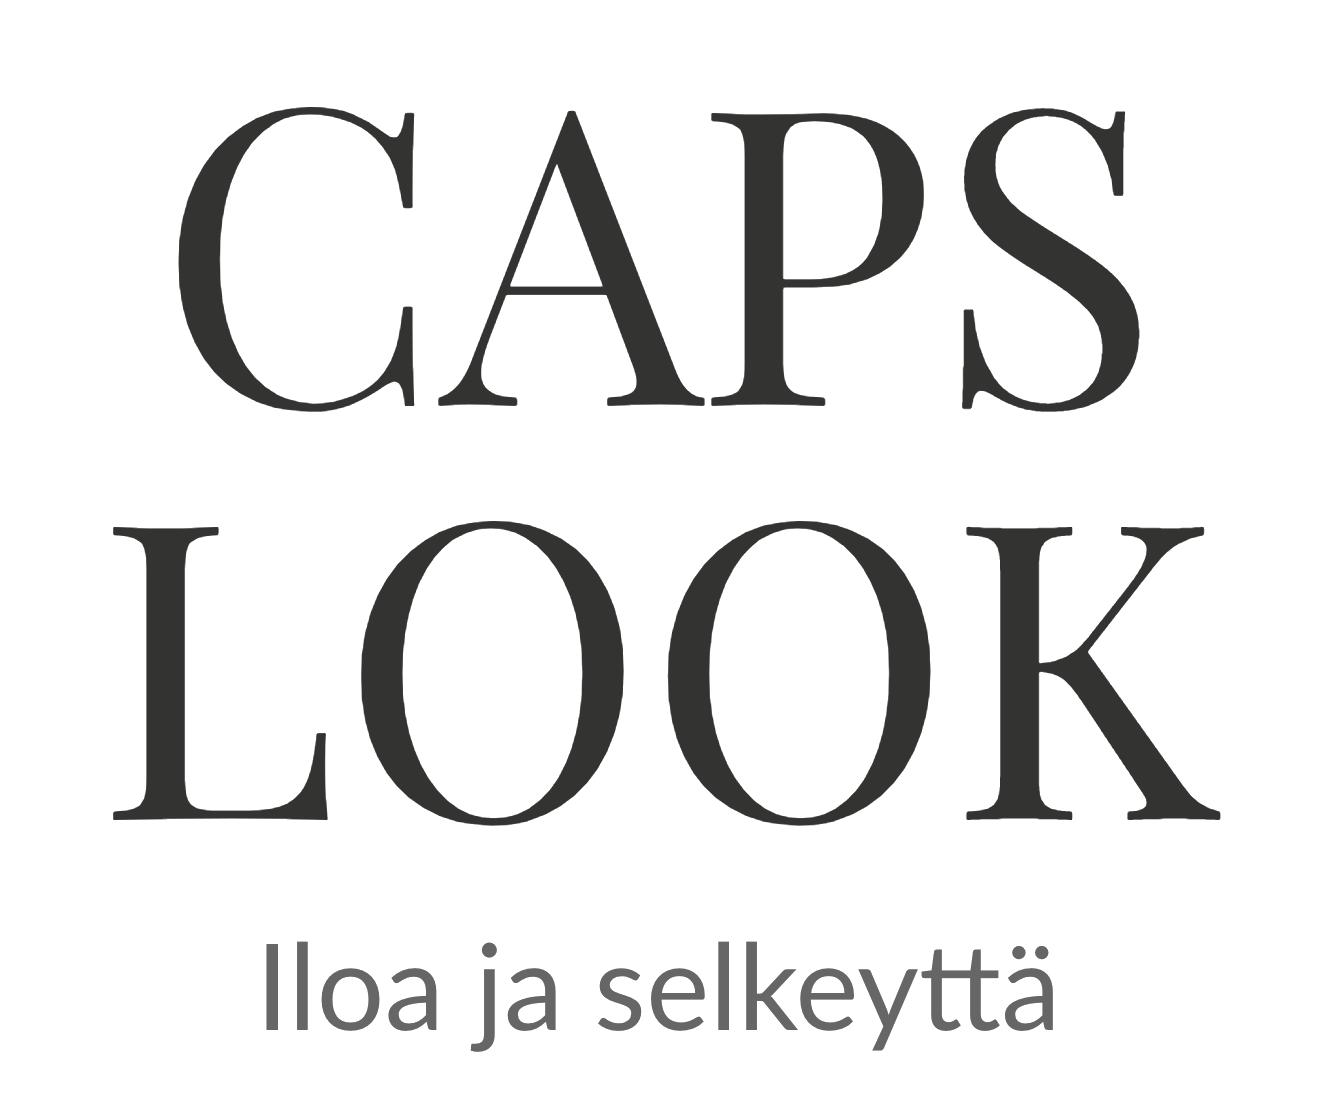 caps look logo